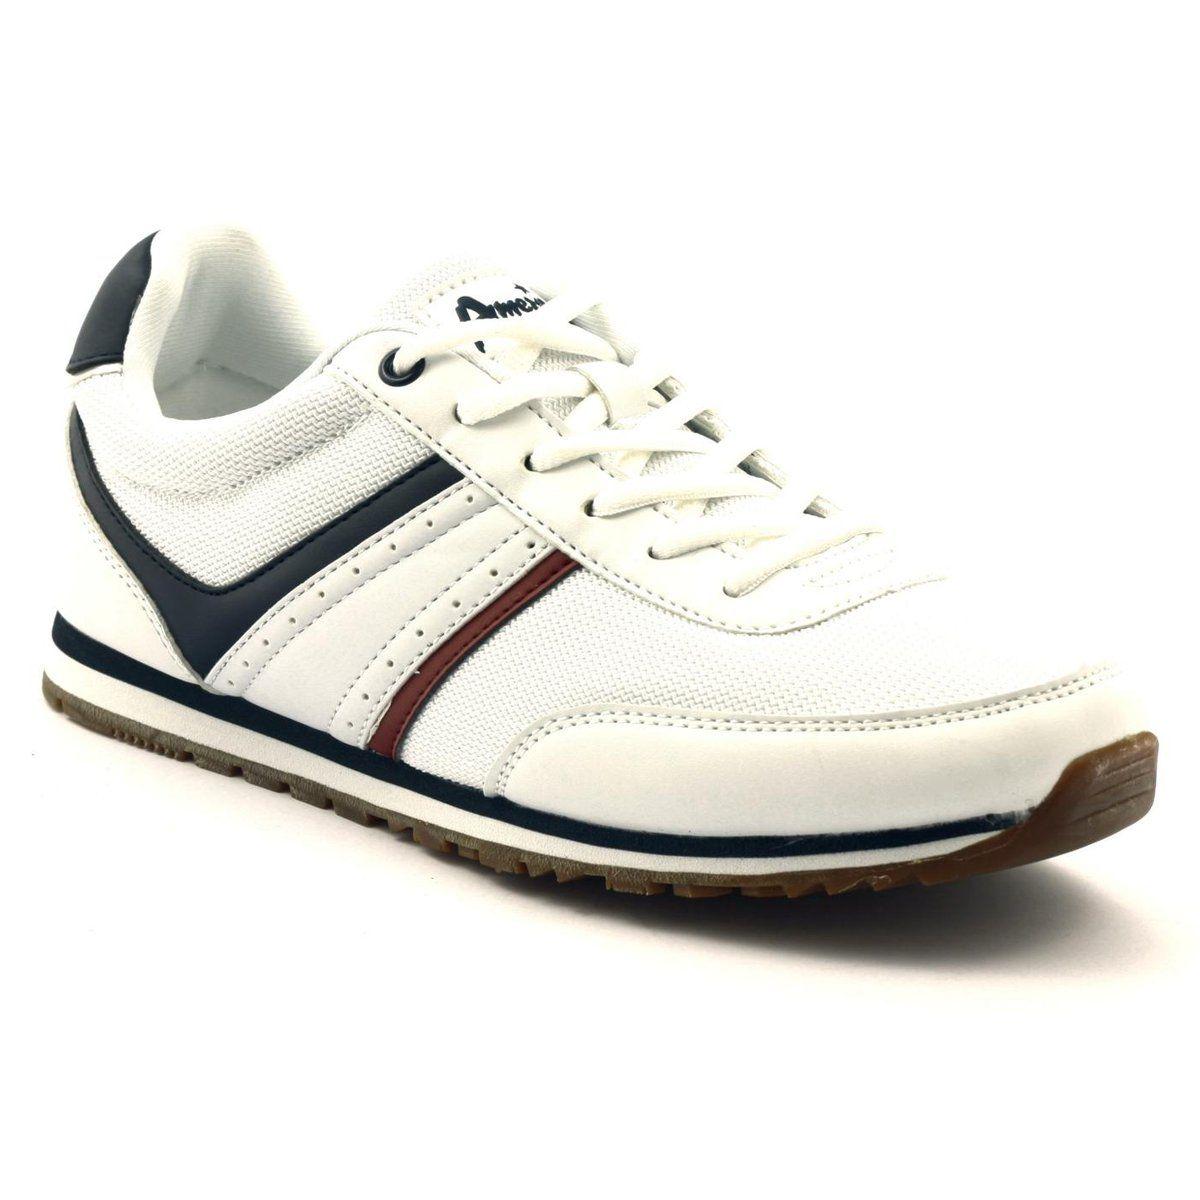 American Club Adi Sportowe Buty Meskie American 2015 Biale Adidas Samba Sneakers Adidas Samba Adidas Sneakers